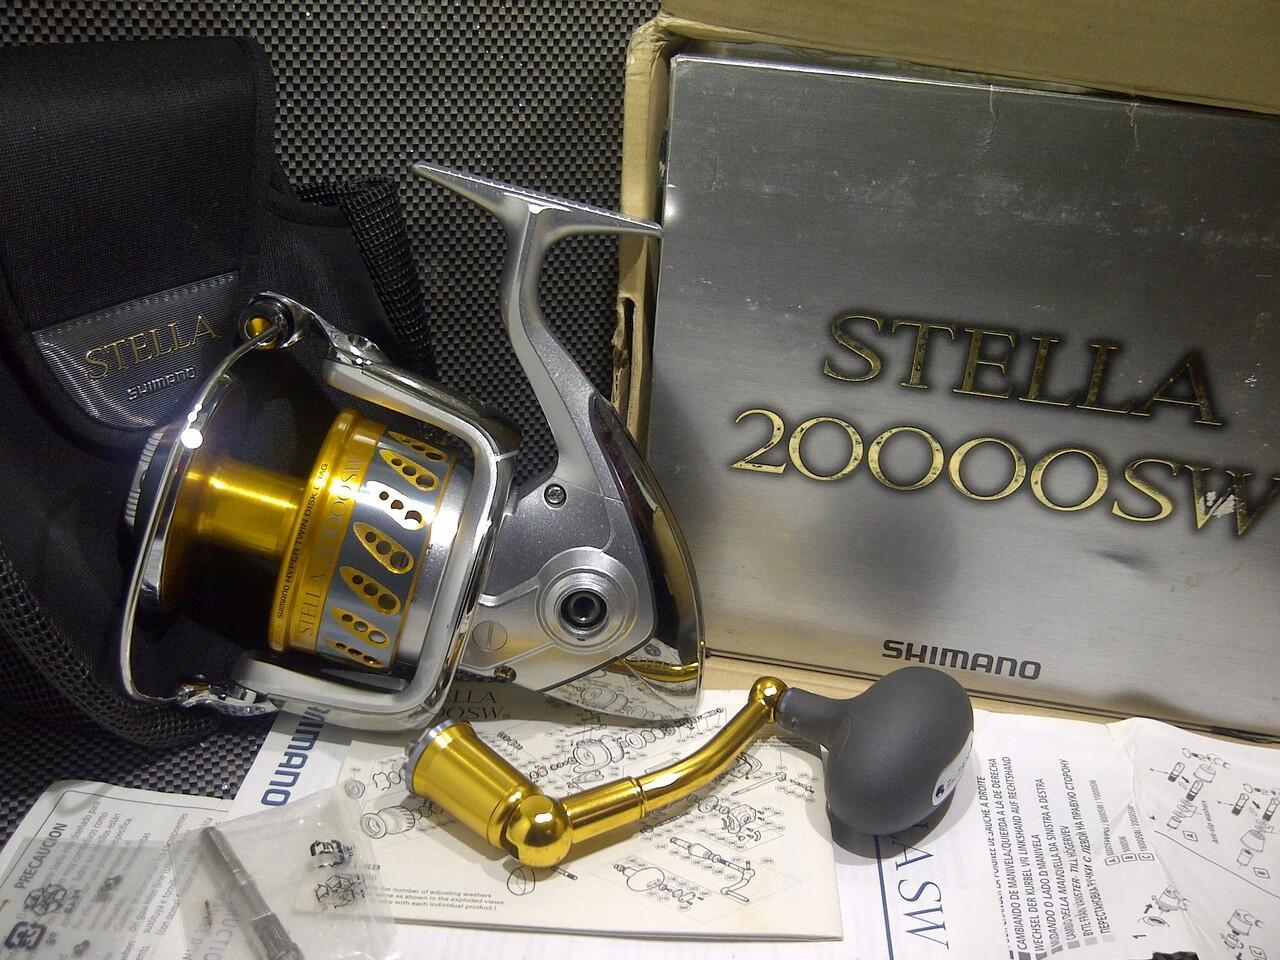 Terjual Reel Pancing Shimano Stella 20000SW 2nd murah